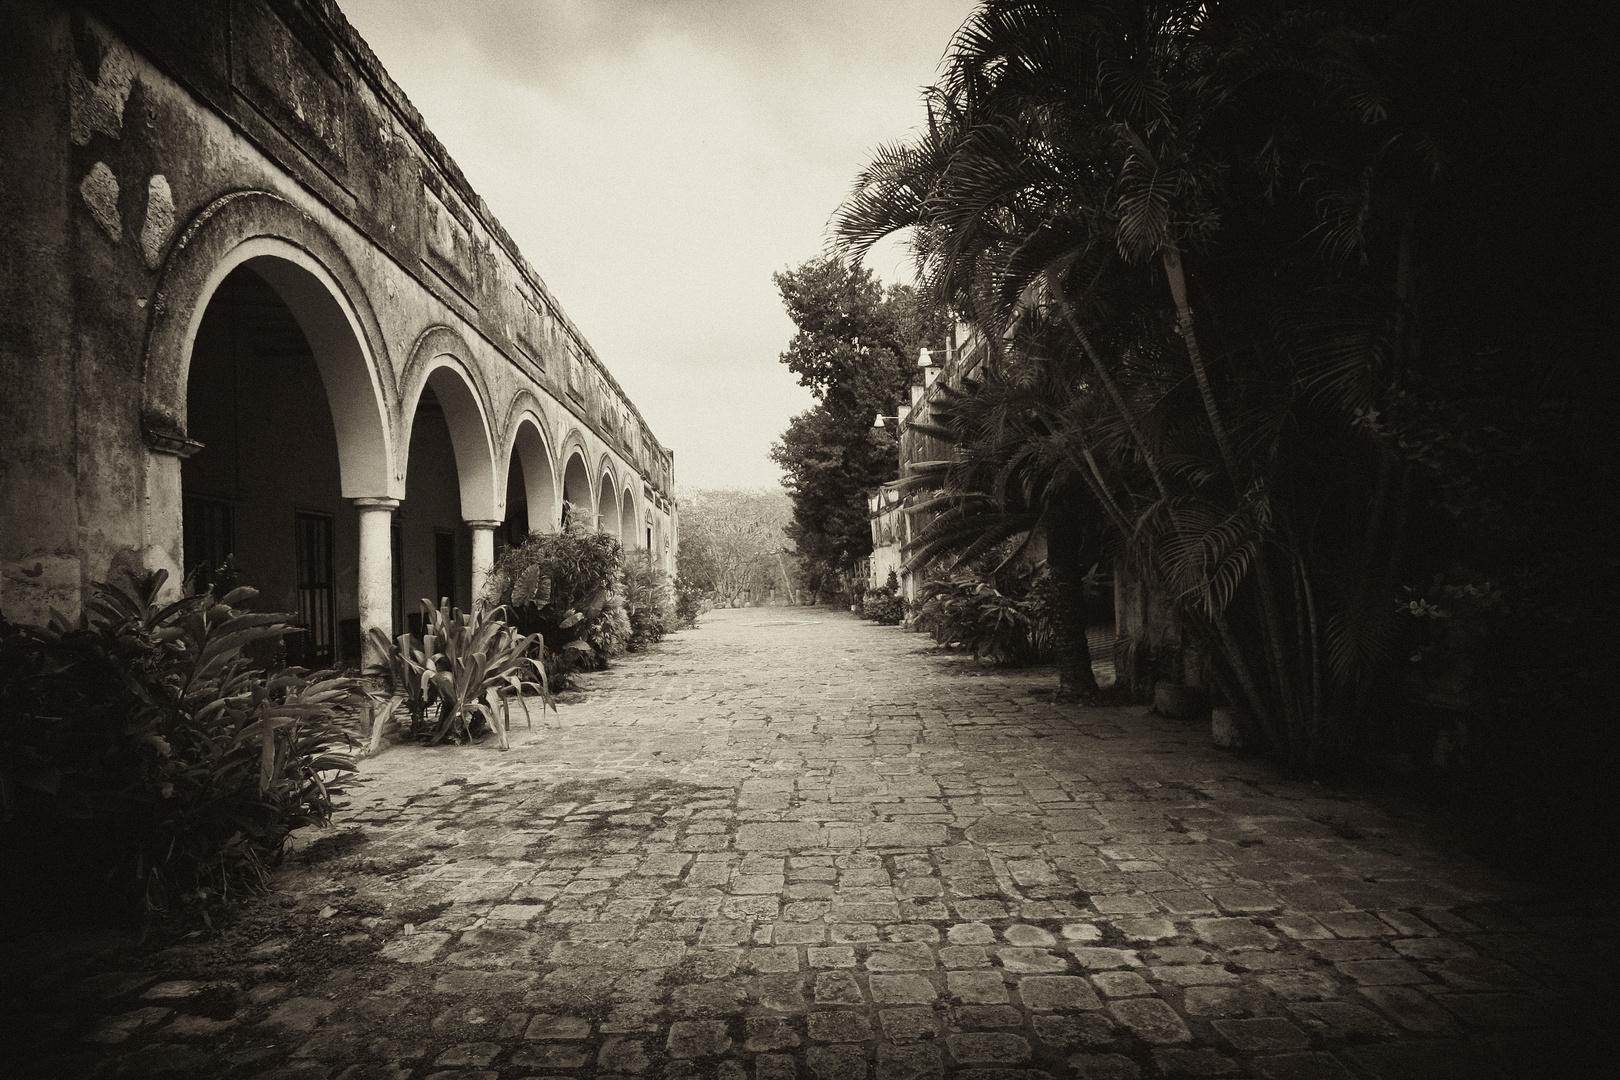 alte Baumwollfabrik in Mexico